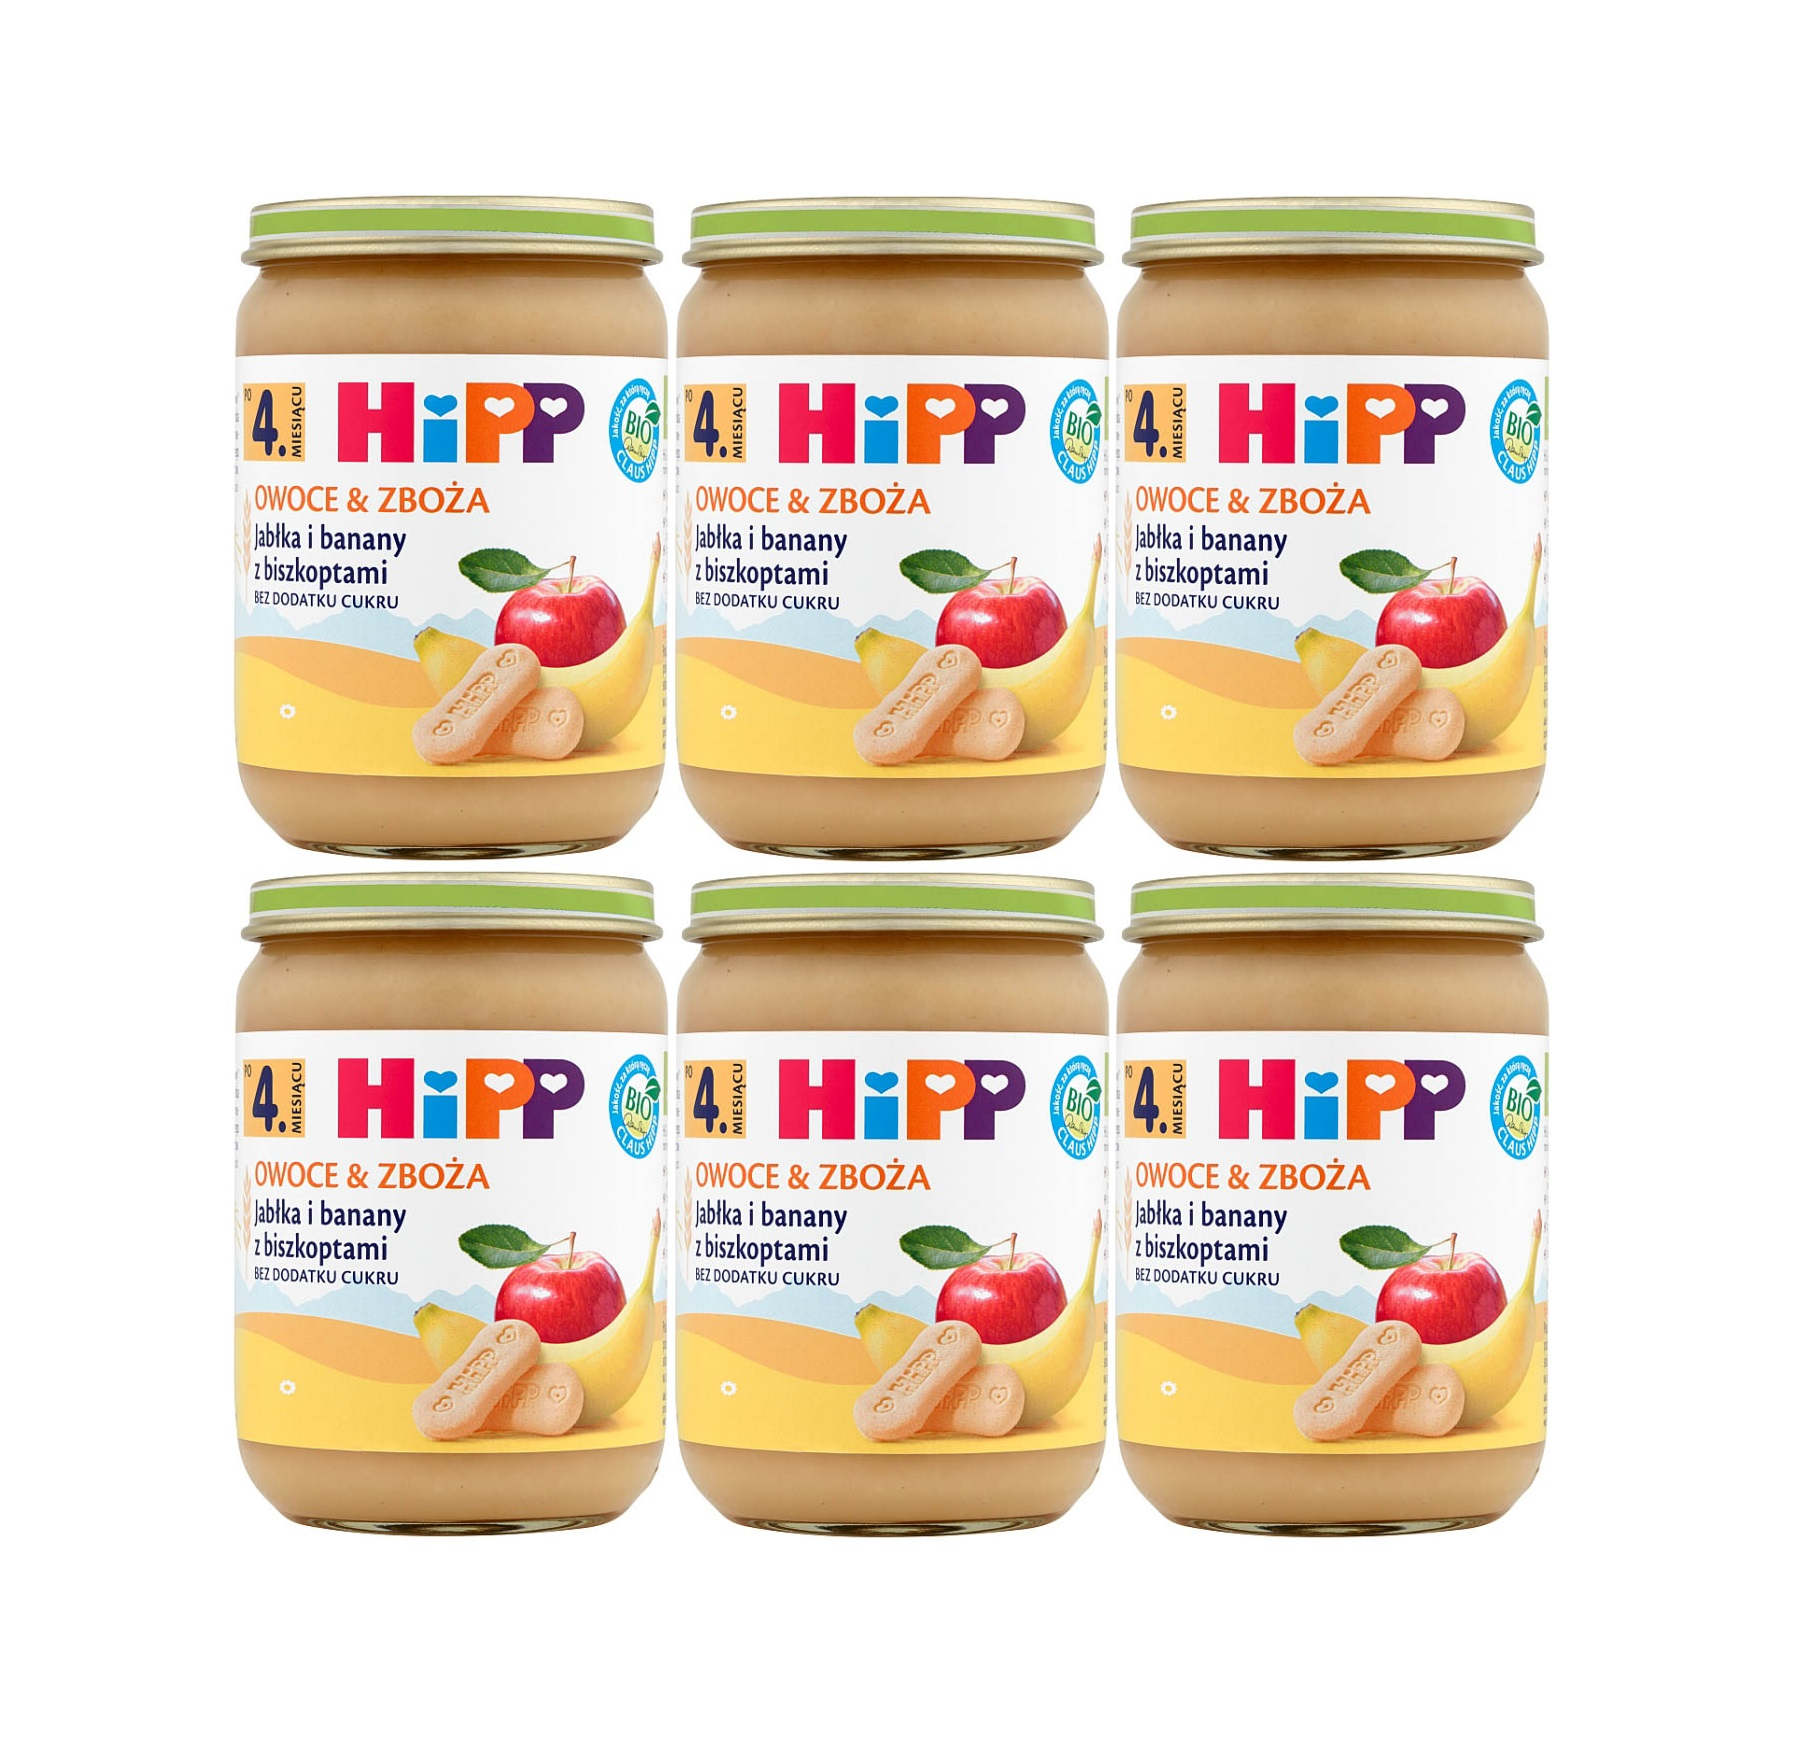 6 pak hipp 190 owoce&zboza jablka z bananami i biszkoptami